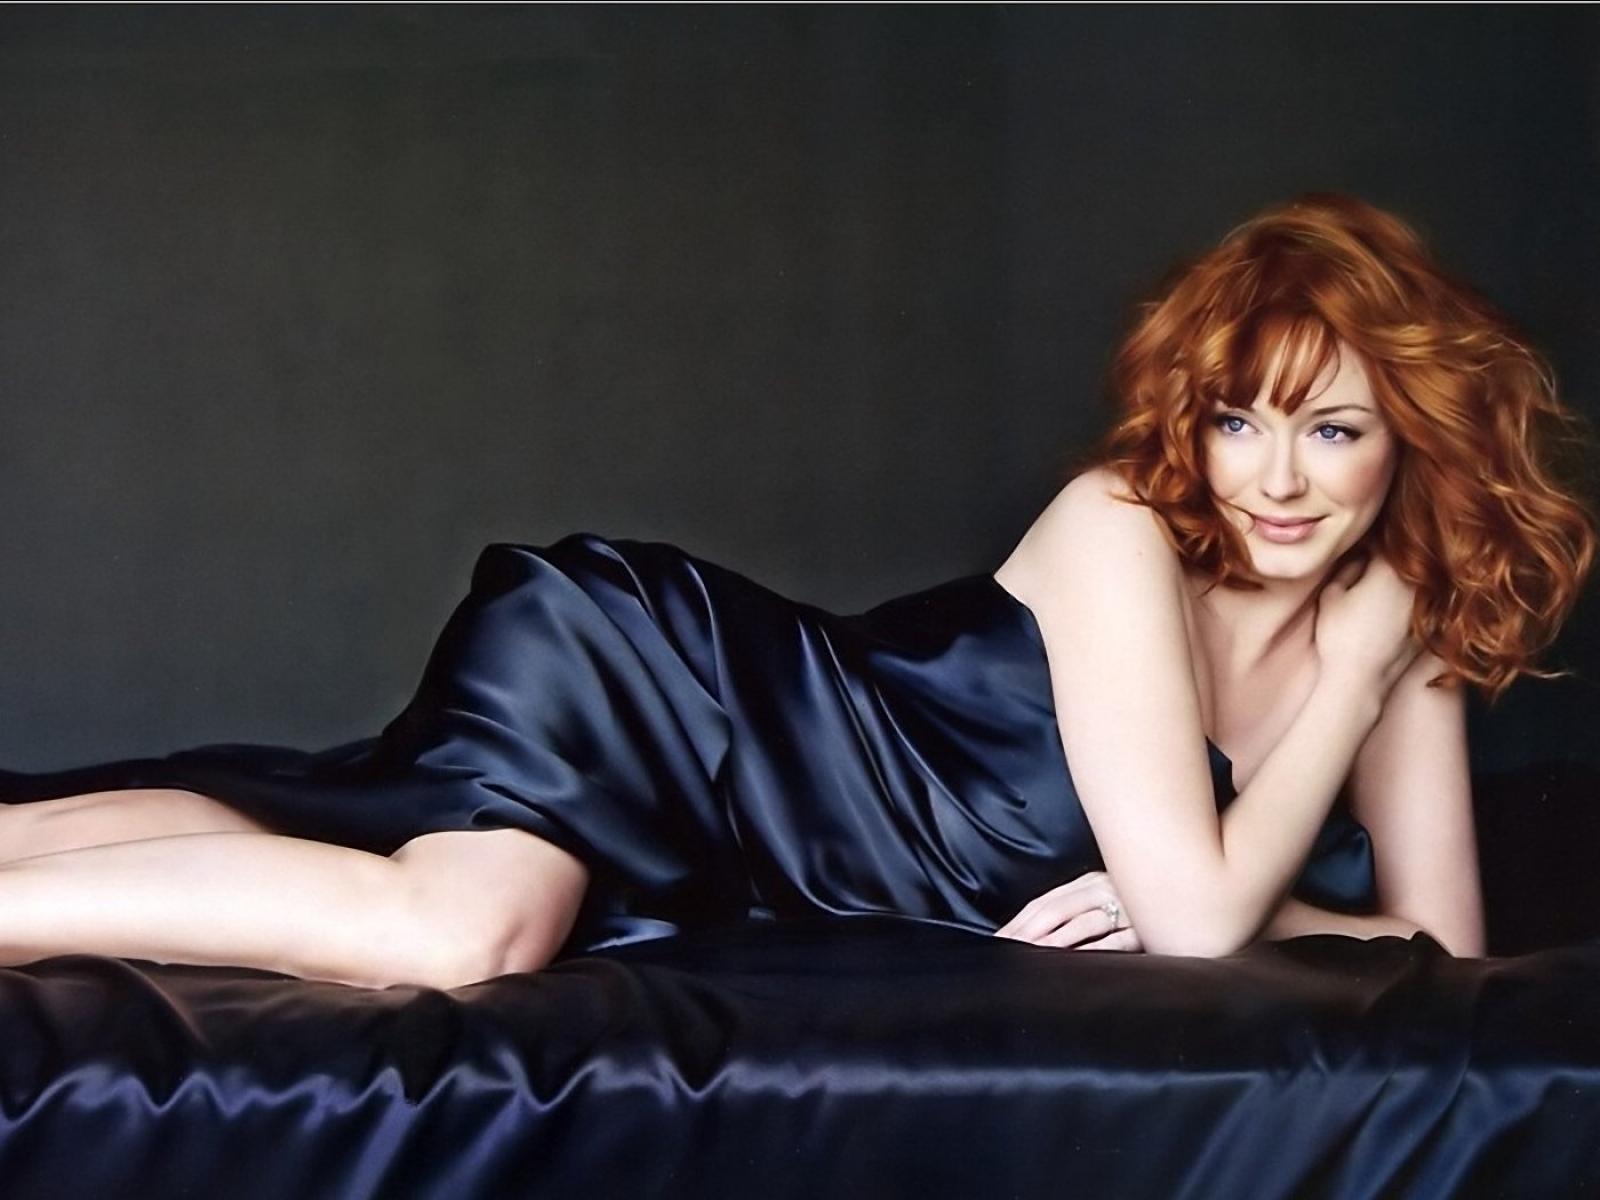 25 The Best Of Christina Hendricks Sexy Images